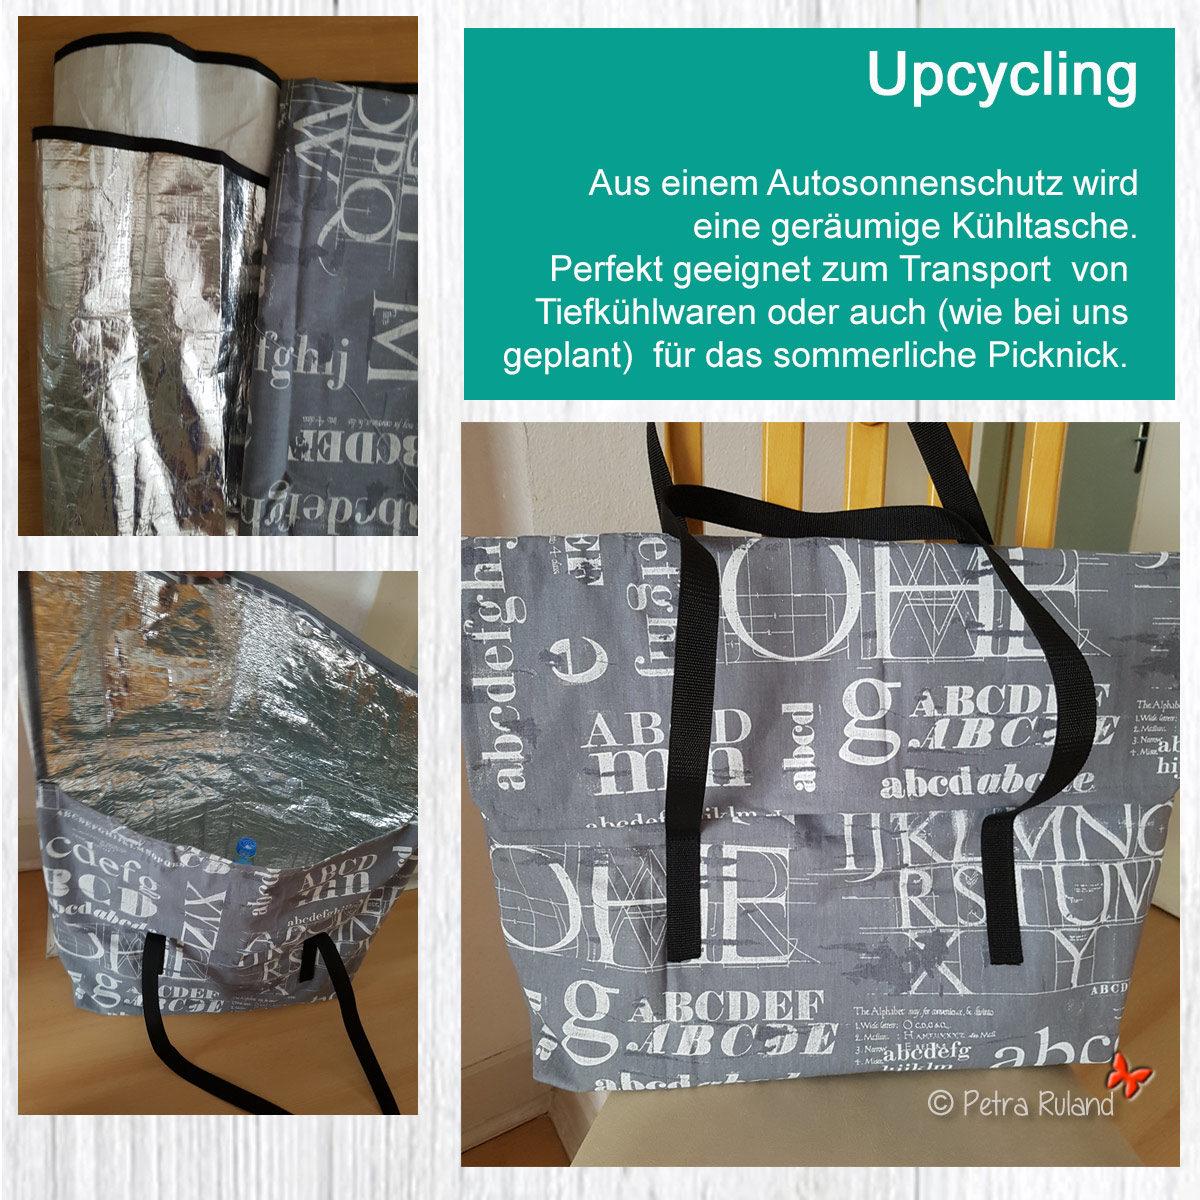 Upcycling – aus Autosonnenschutz wird Kühltasche